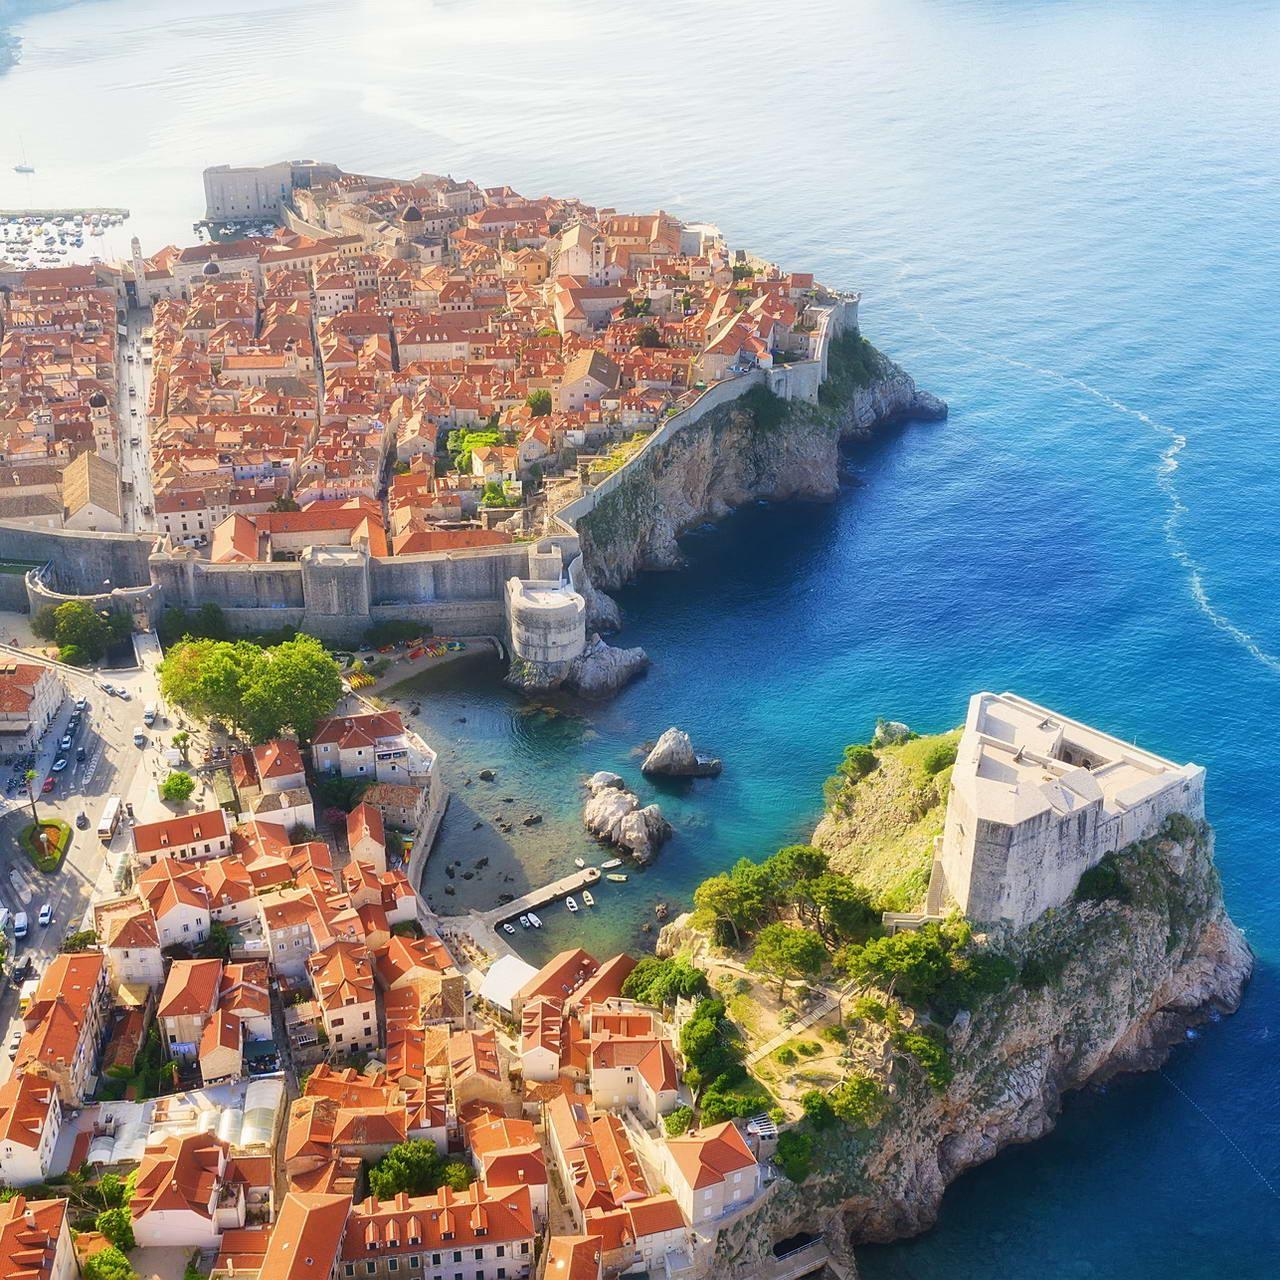 https://www.bestslovakiatours.com/wp-content/uploads/2021/09/Best-Slovakia-Tours_Croatia_resize.jpg